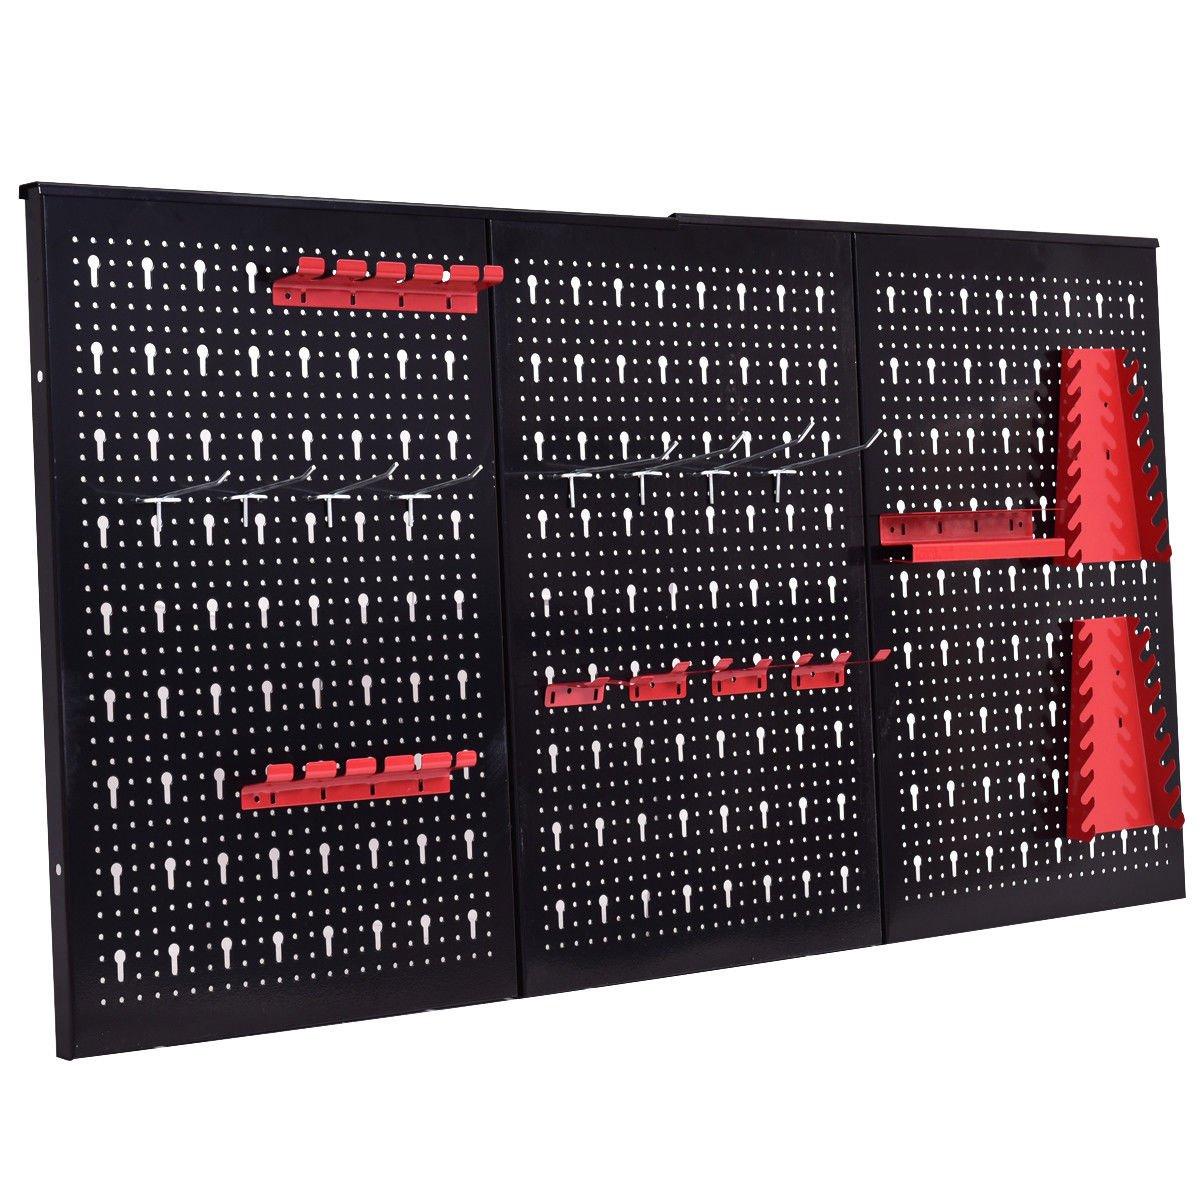 24'' x 48'' Metal Pegboard Panels Garage Tool Board Storage Organizer Holder Black by allgoodsdelight365 (Image #5)